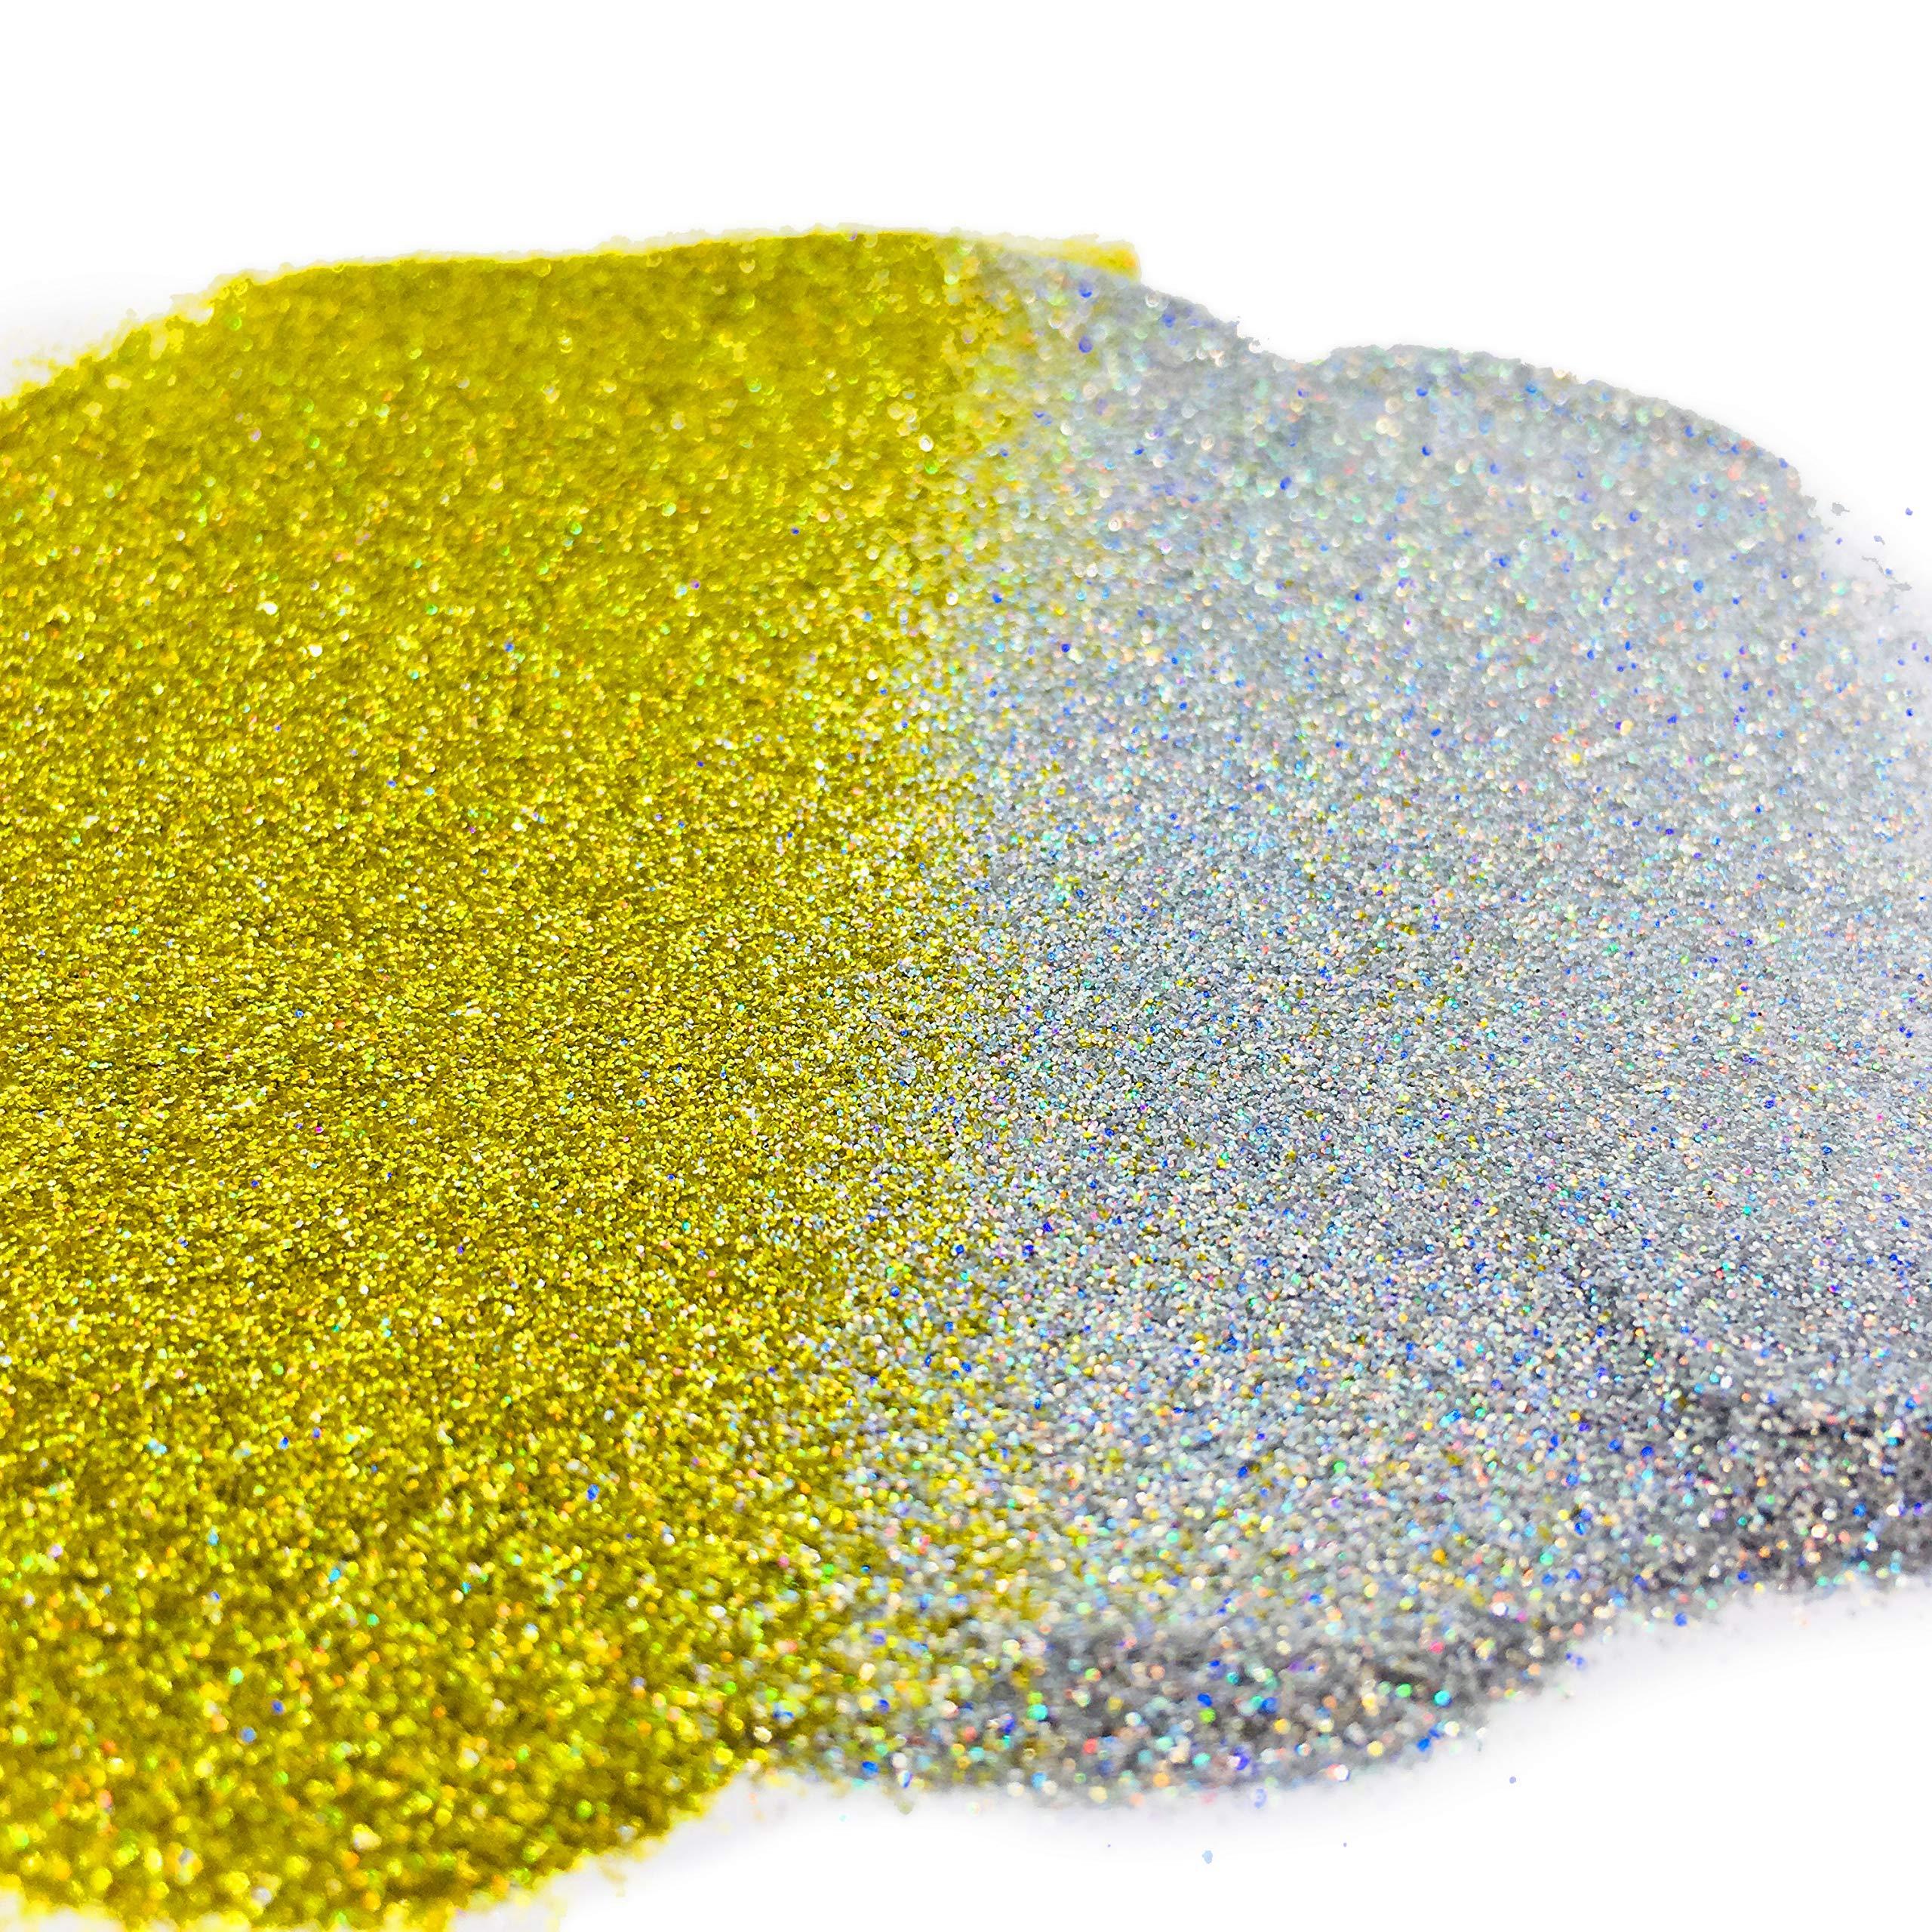 Biodegradable Body Glitter (Combo Pack) by Alternative Imagination (Image #4)